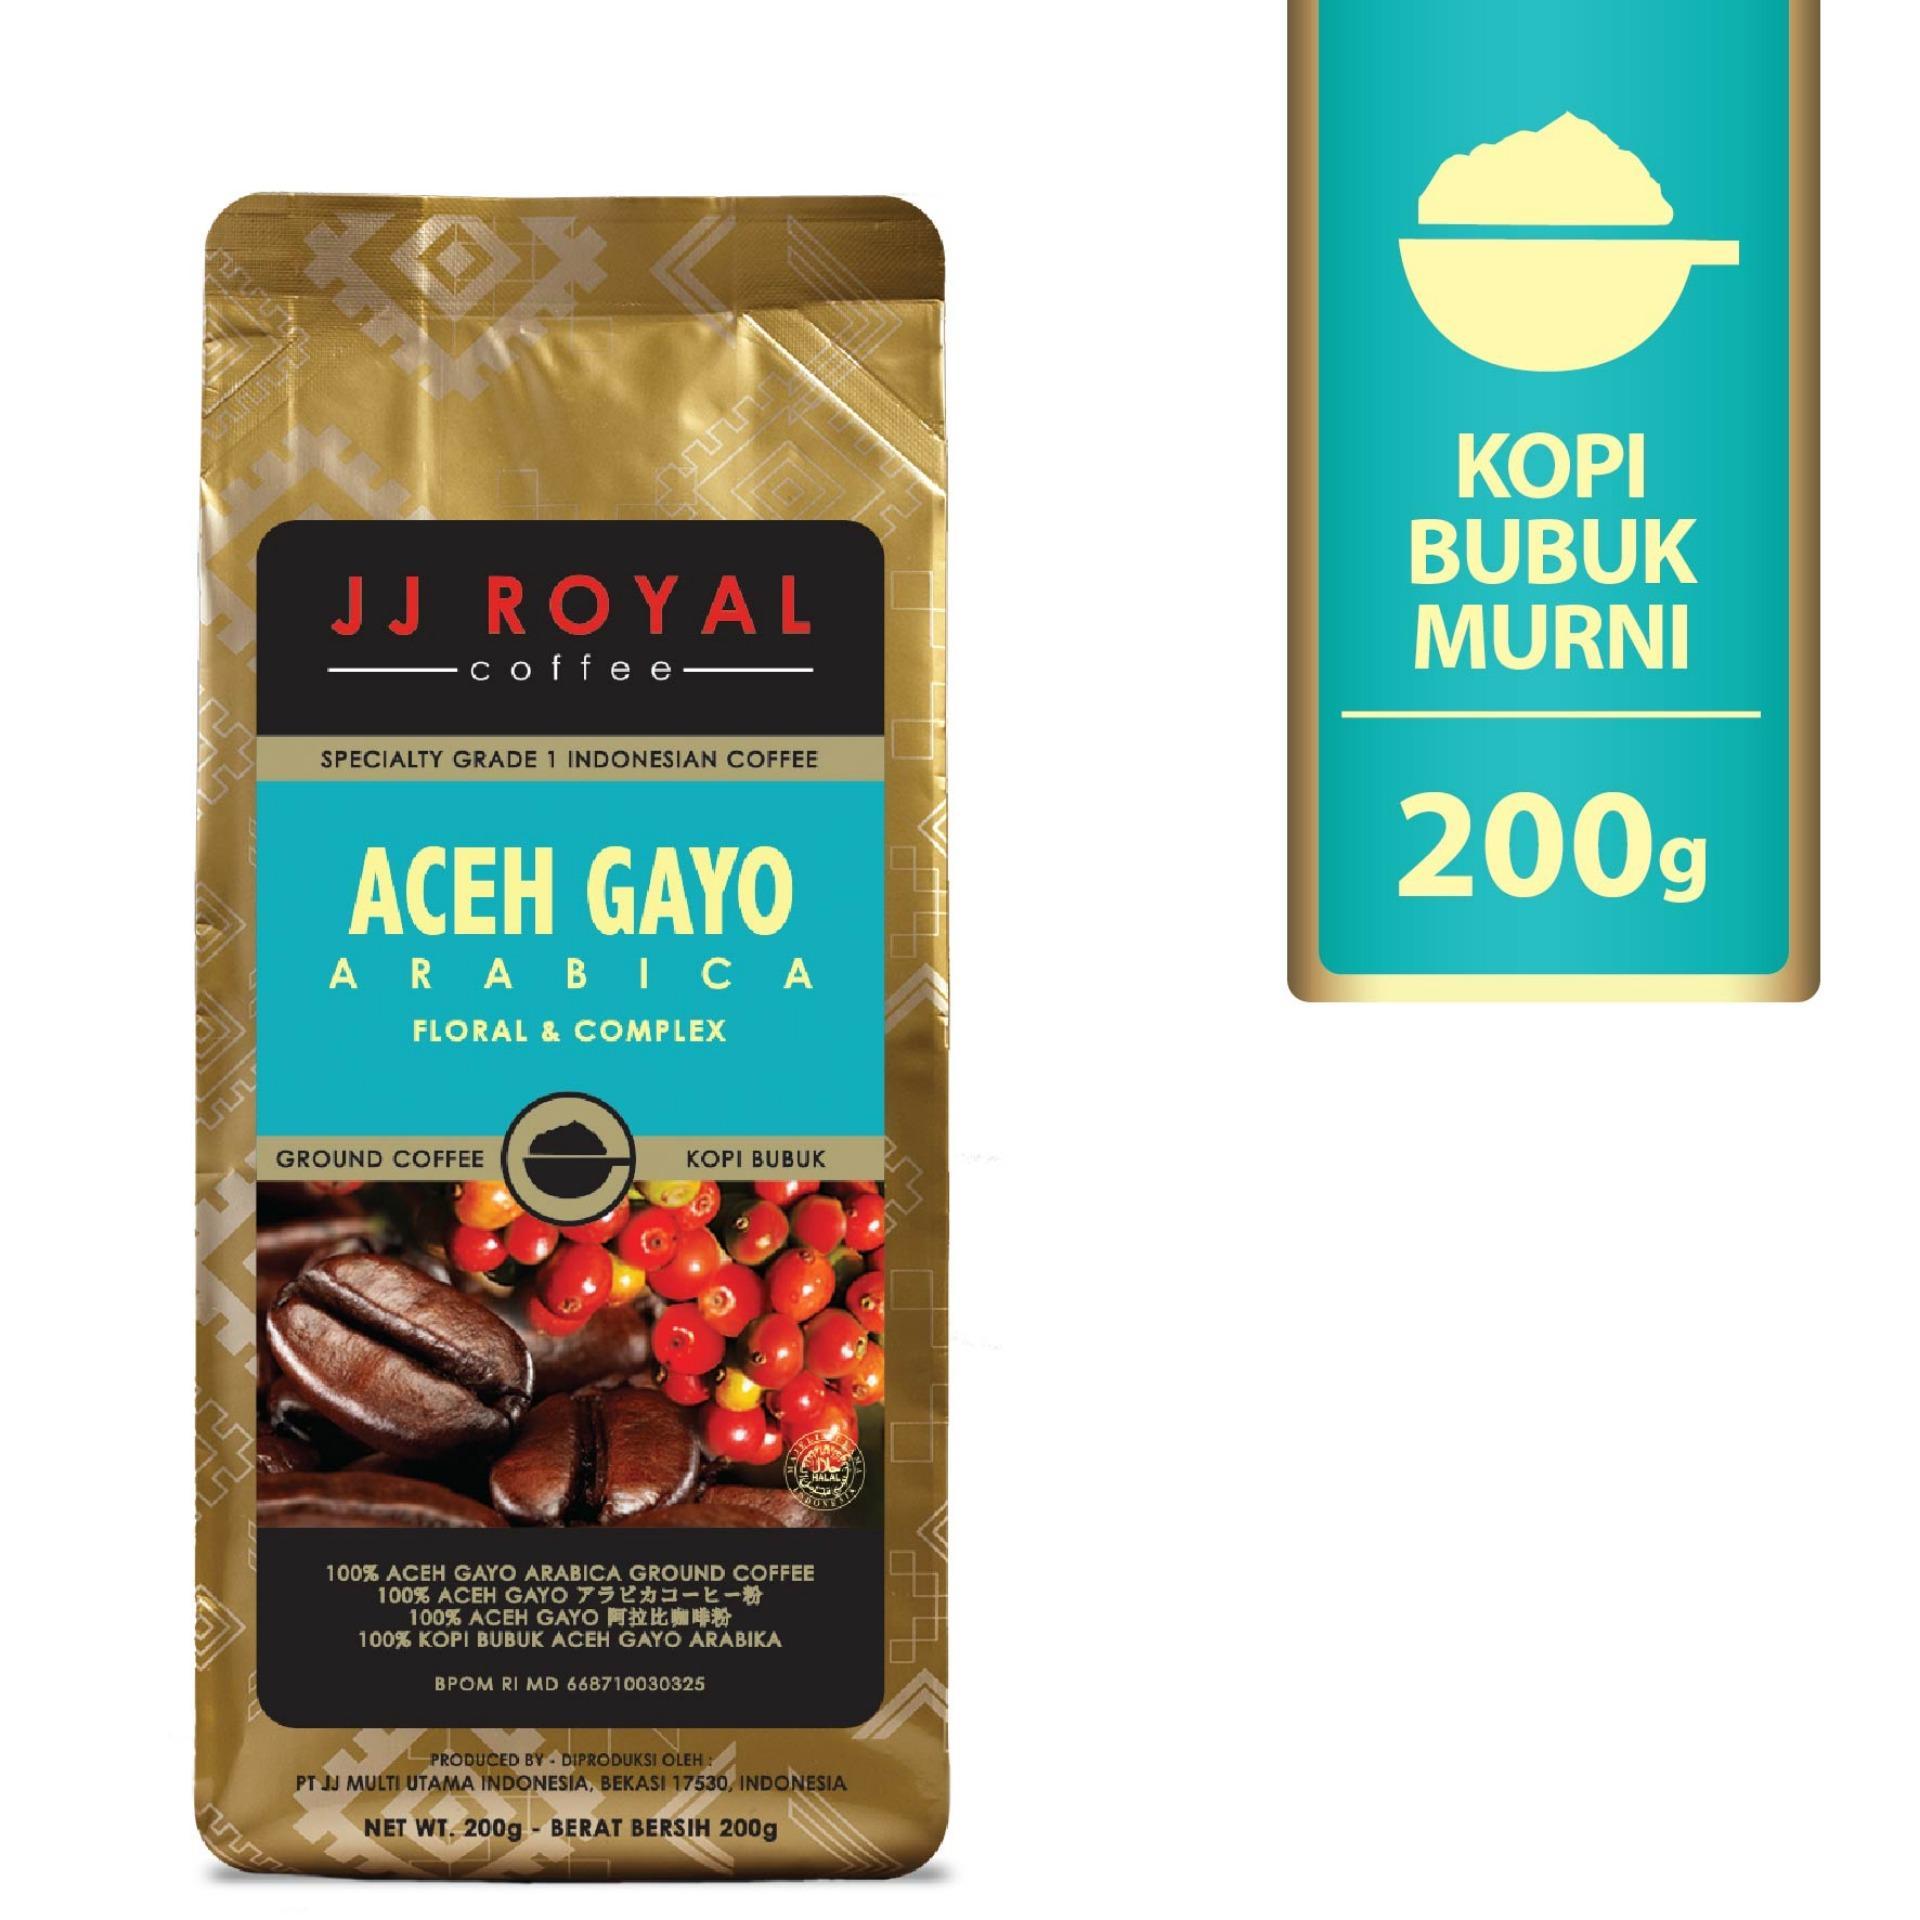 Toko Indonesia Perbandingan Harga Minuman All 22 05 18 Nutrisalin Garam Diet 400 Gr Img